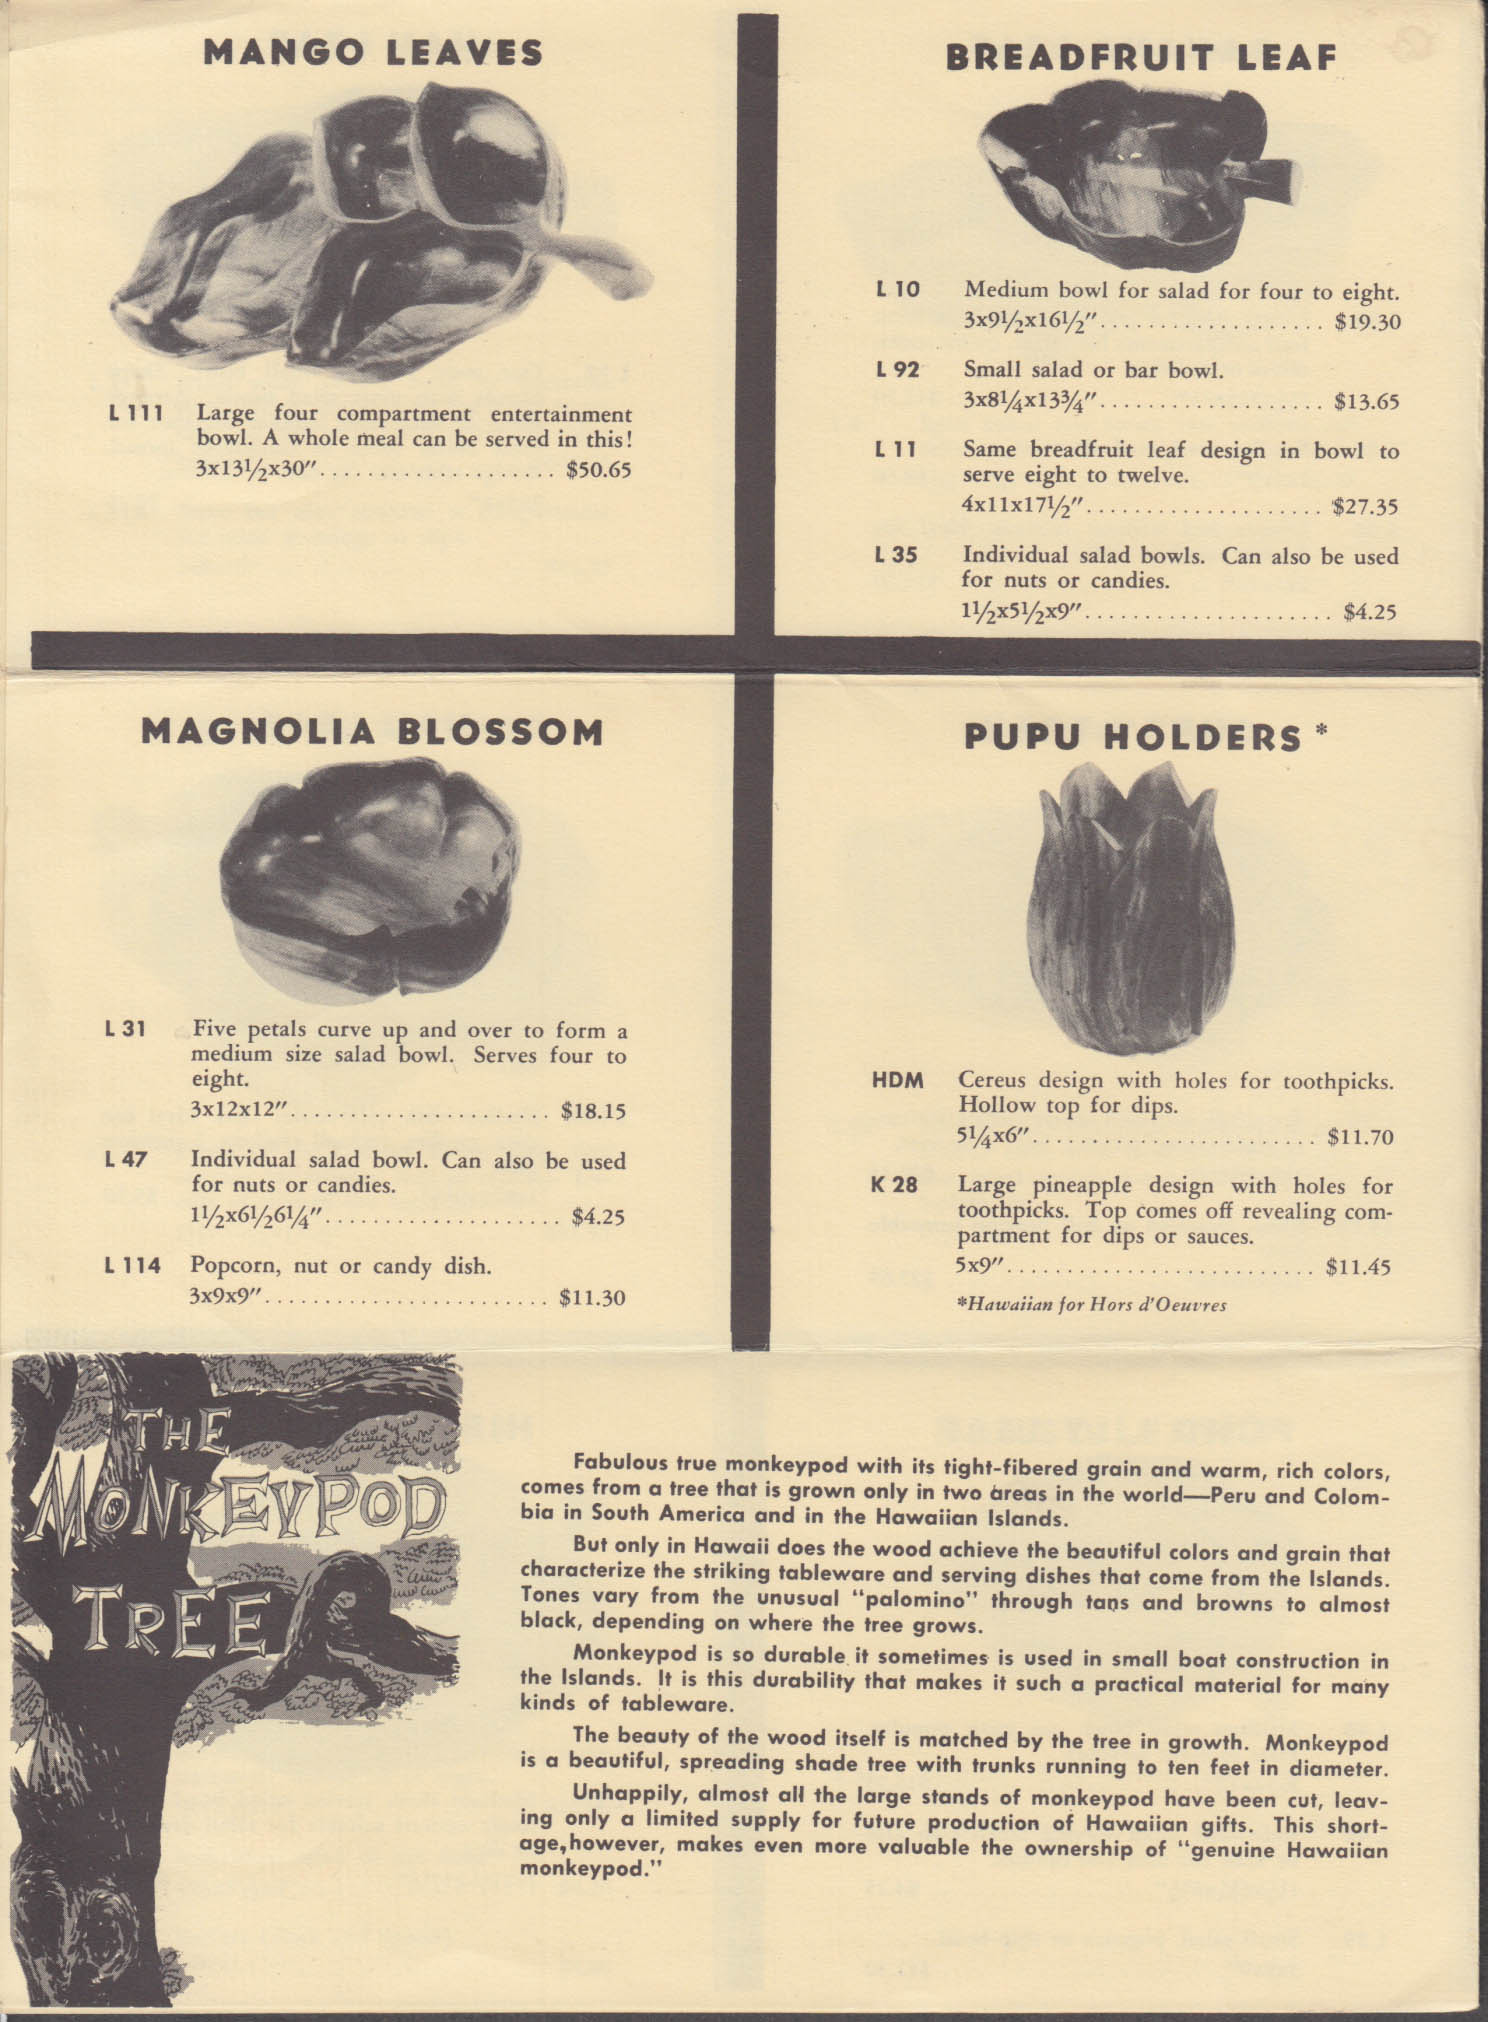 Monkeypod Gifts Christian Martinus Sorensen Woodcarver of Hawaii catalog 1950s